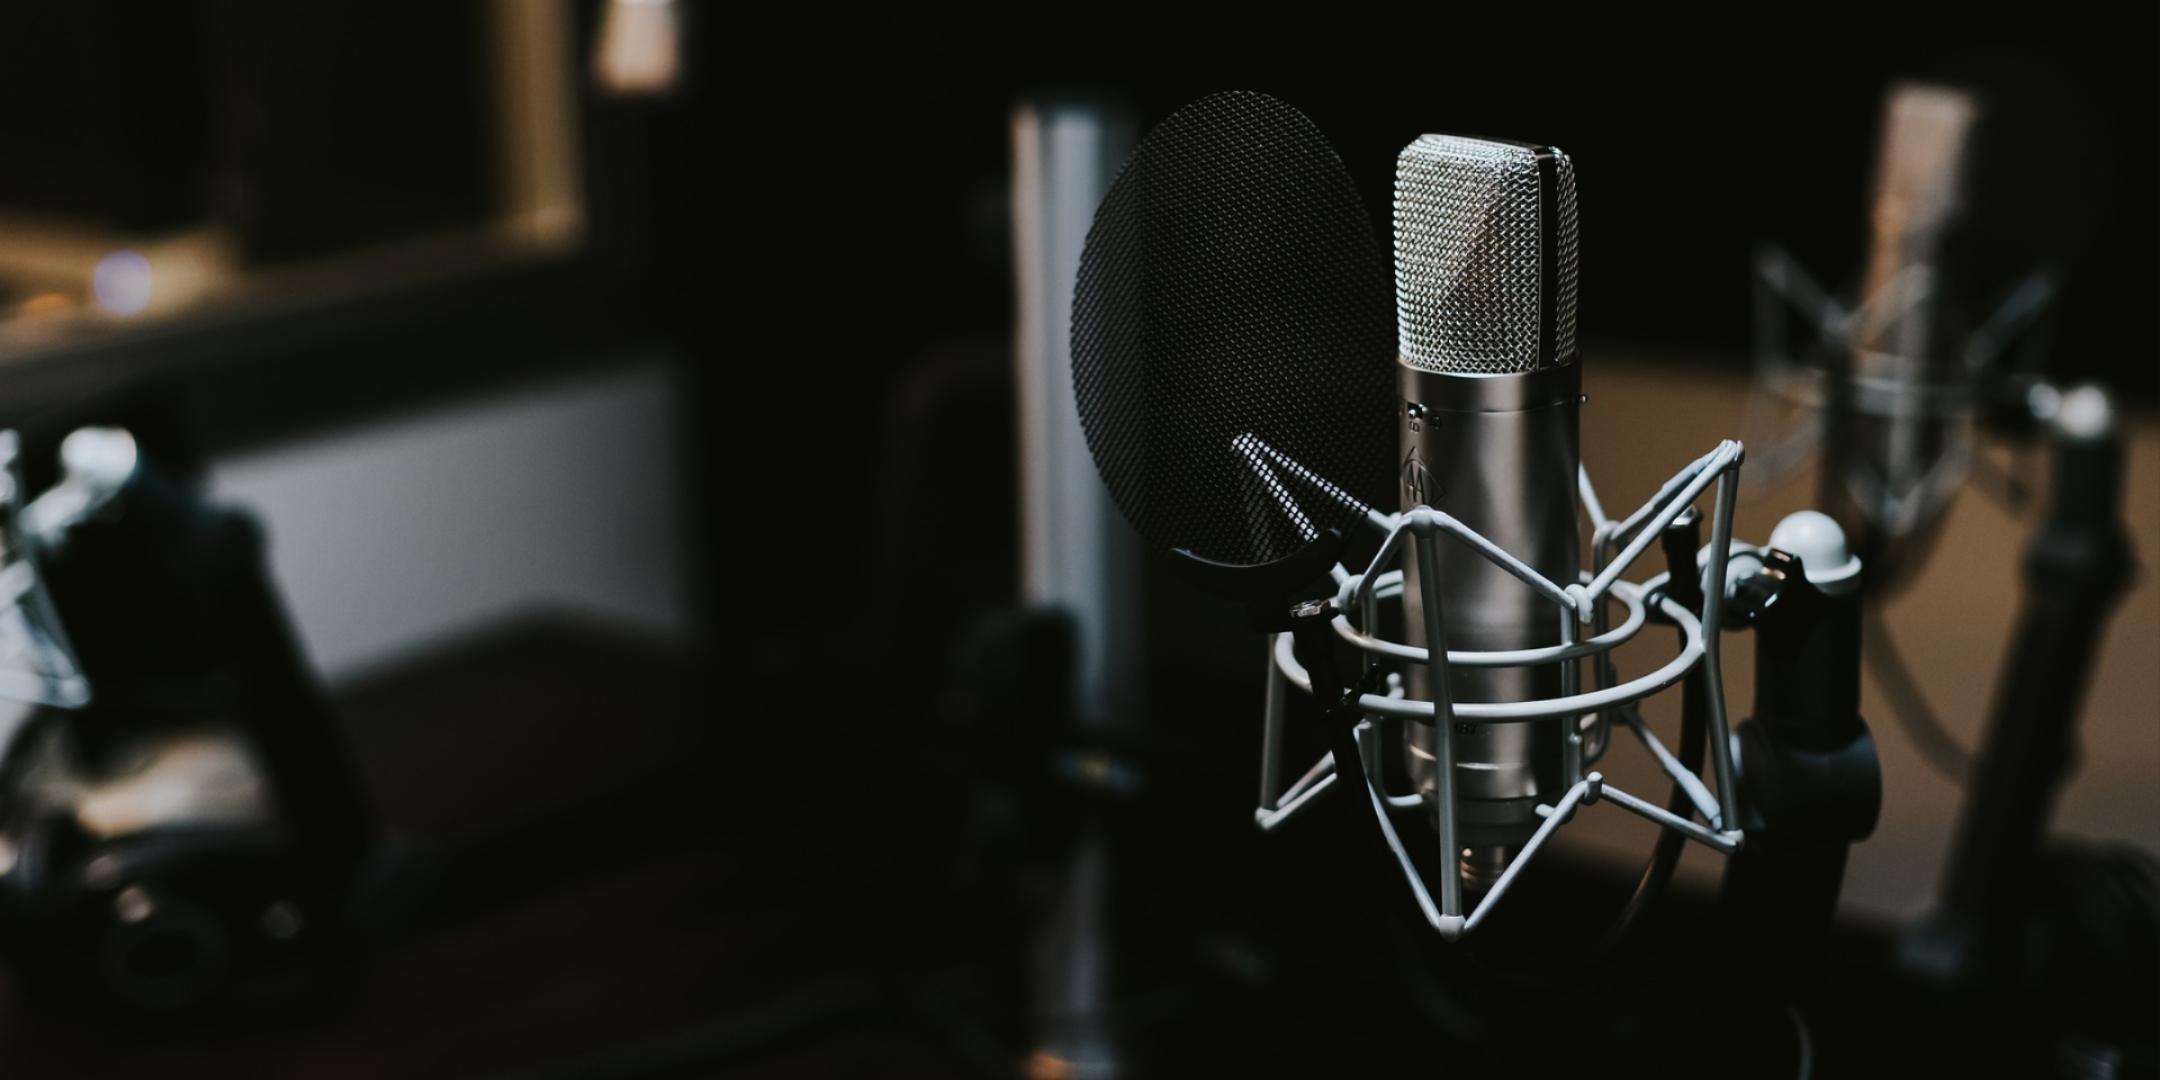 Musik & Soundeffekte